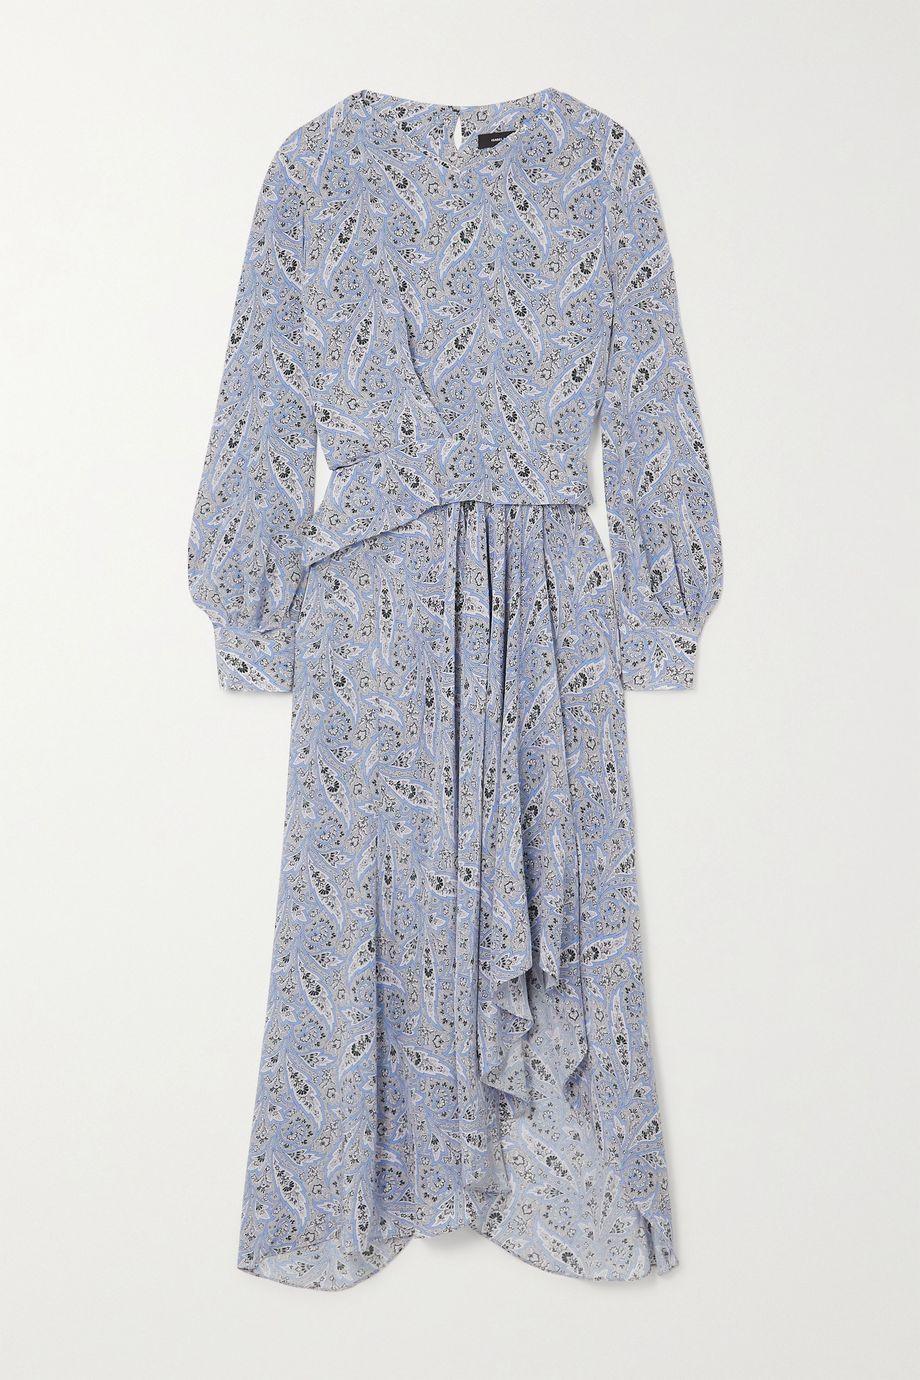 Isabel Marant Romina asymmetric paisley-print silk-crepe midi dress